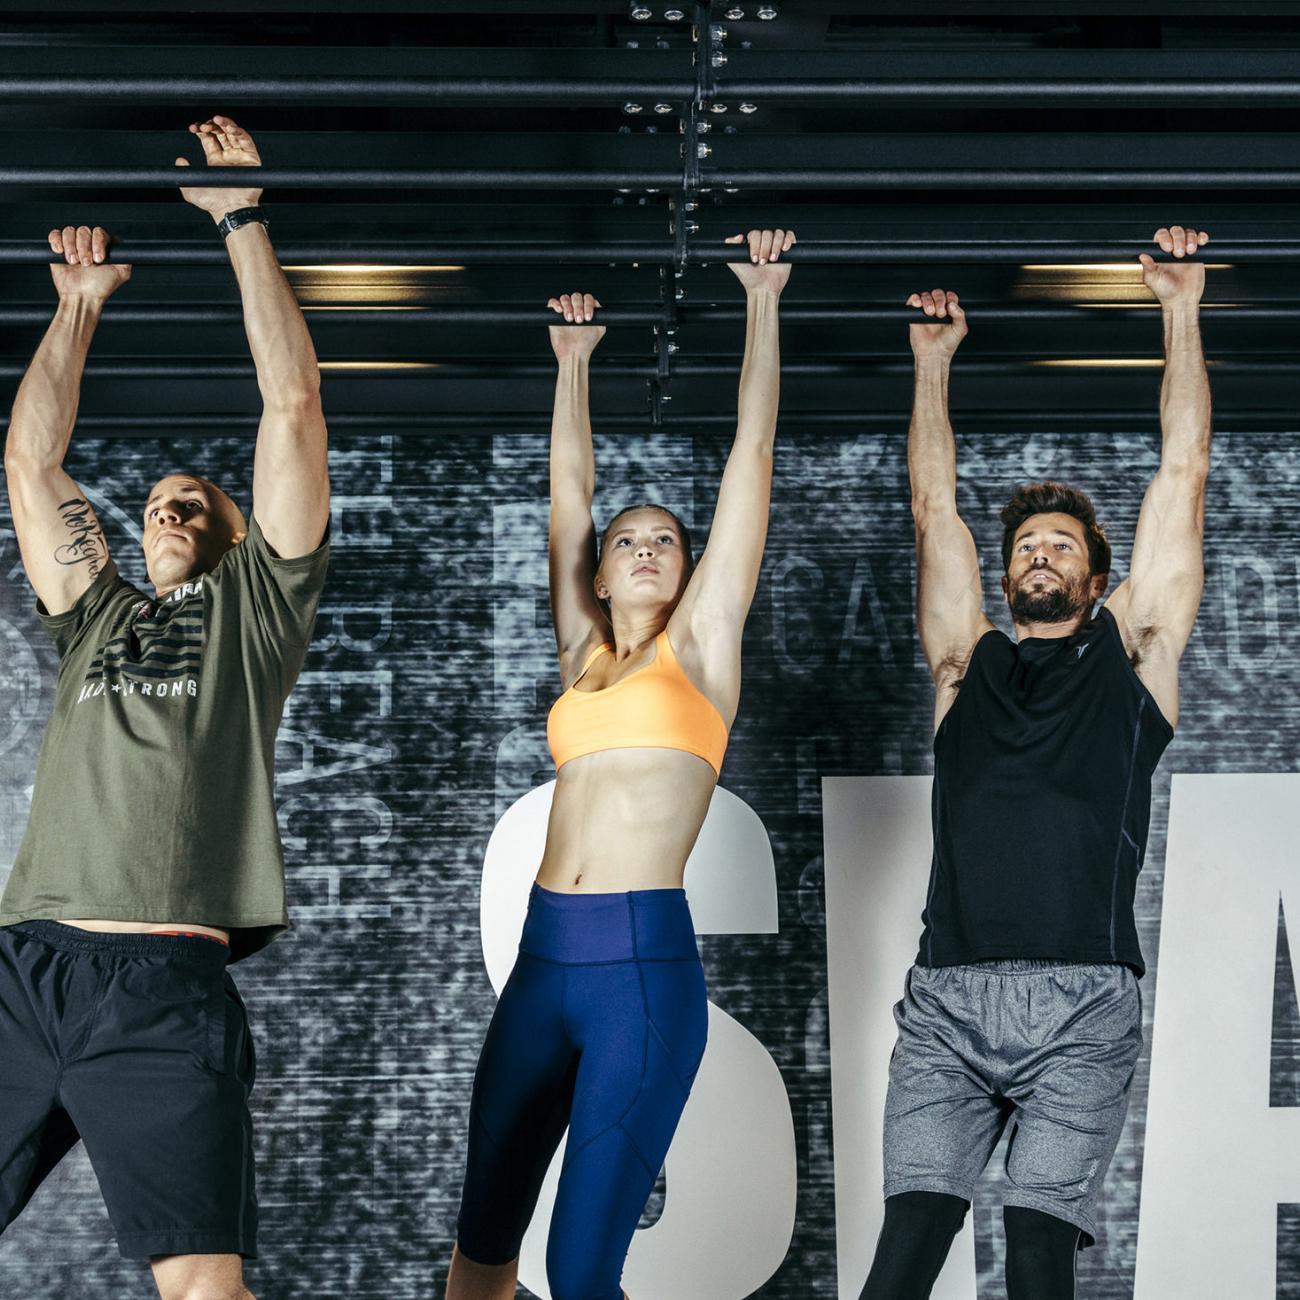 Three people training at Spartan gym